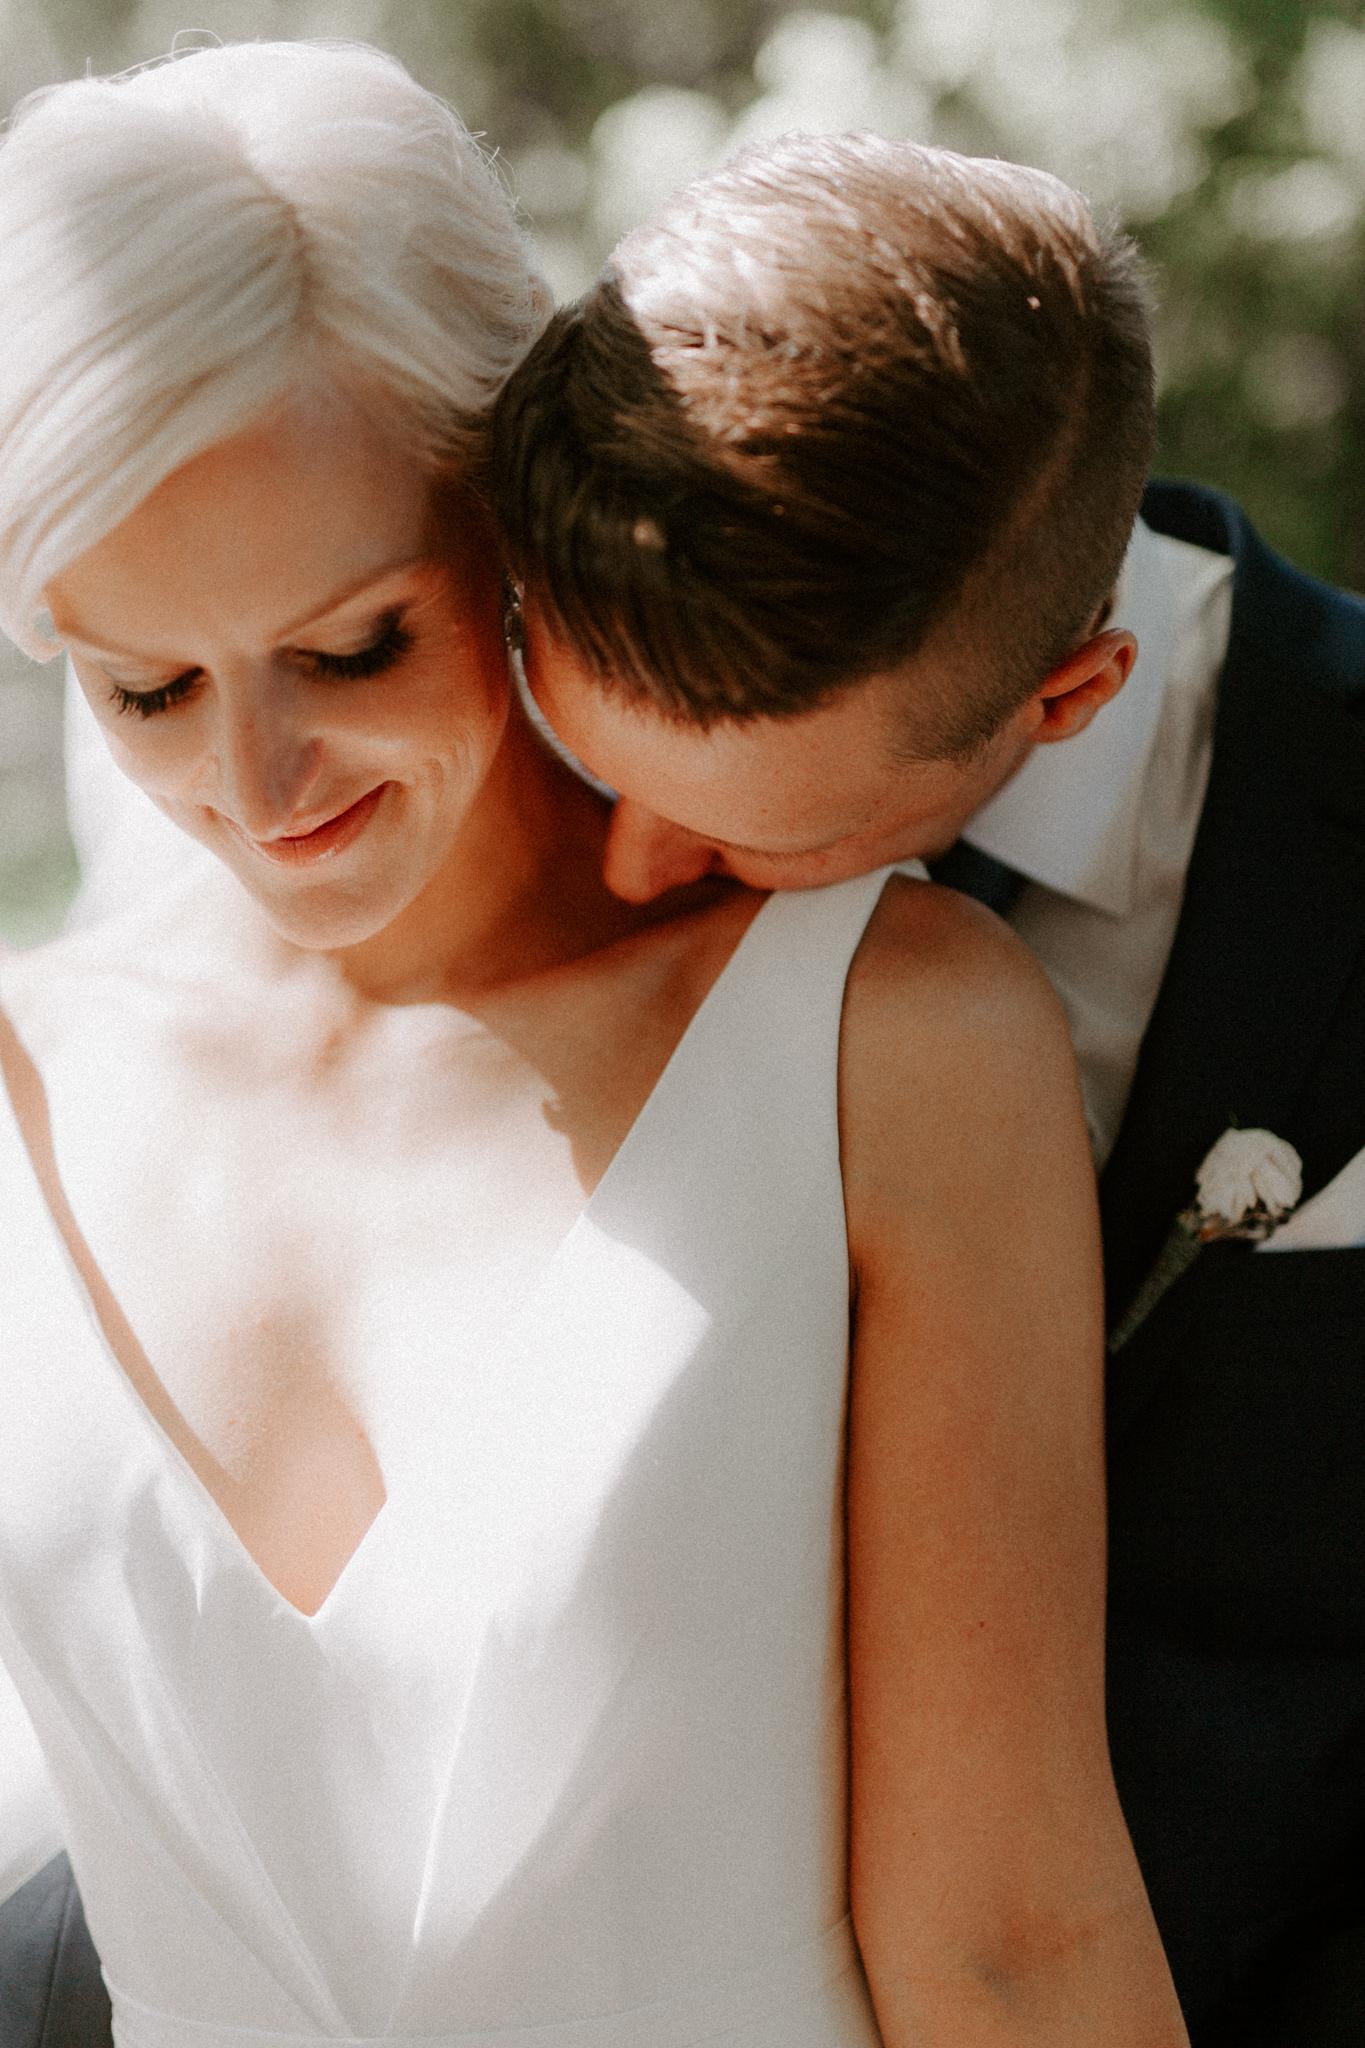 St-Kilda-Garden-Wedding-Emotions-and-Math-Photograph-089.jpg